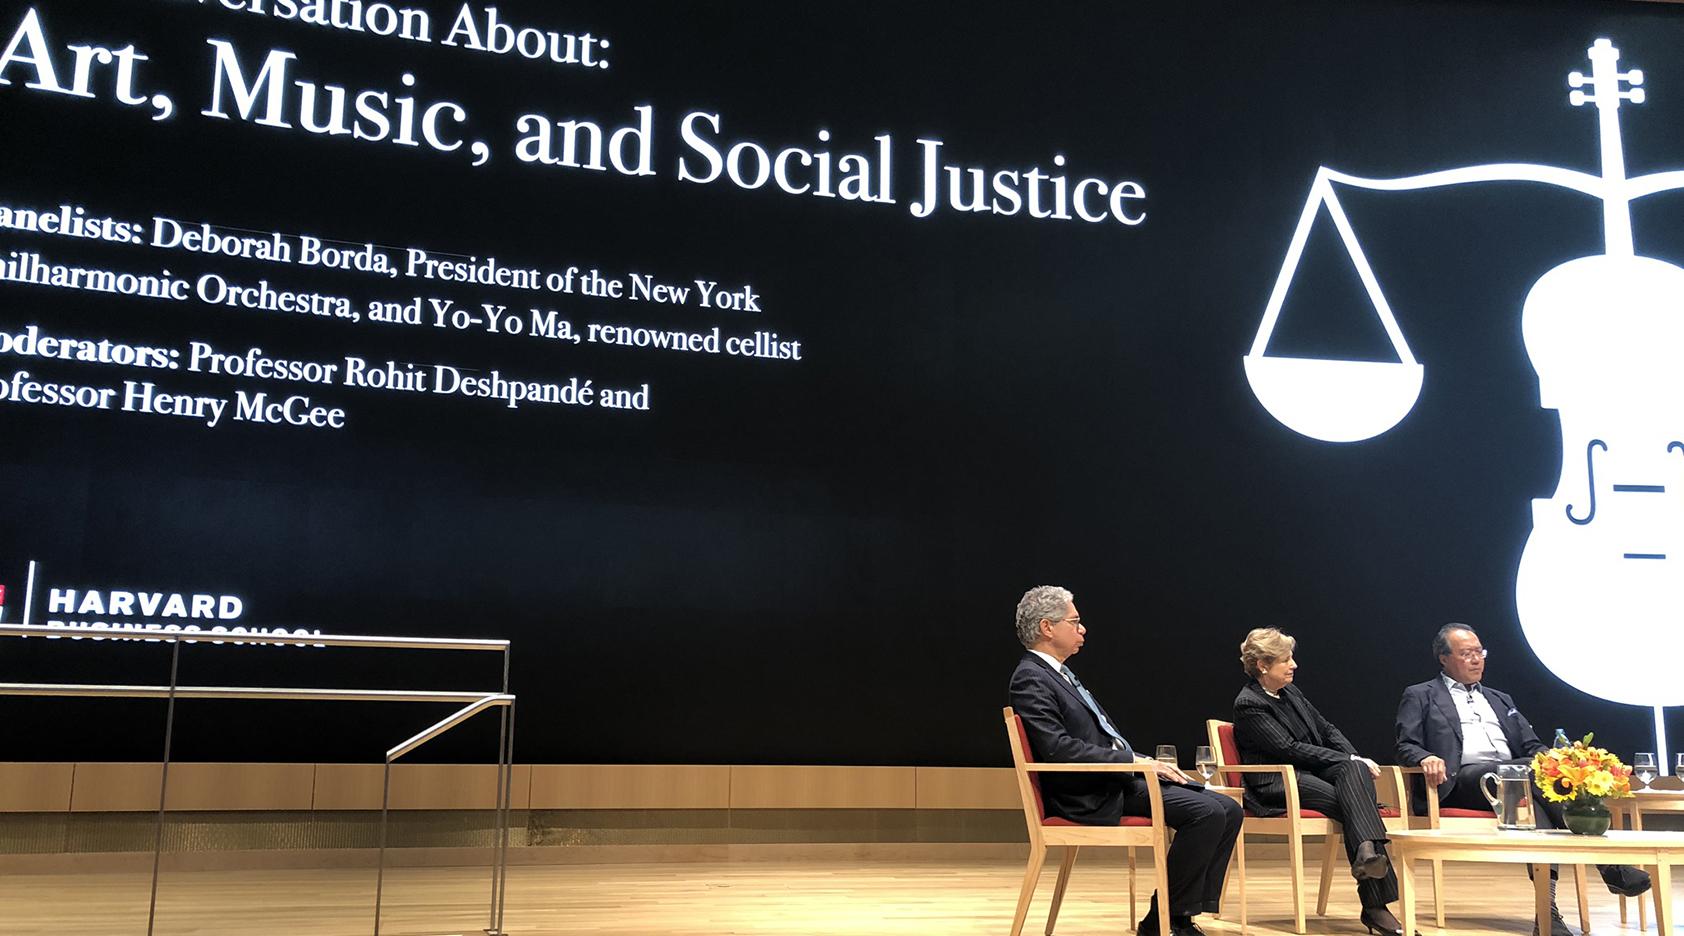 Yo-Yo Ma and Deborah Borda Discuss Art, Music, and Social